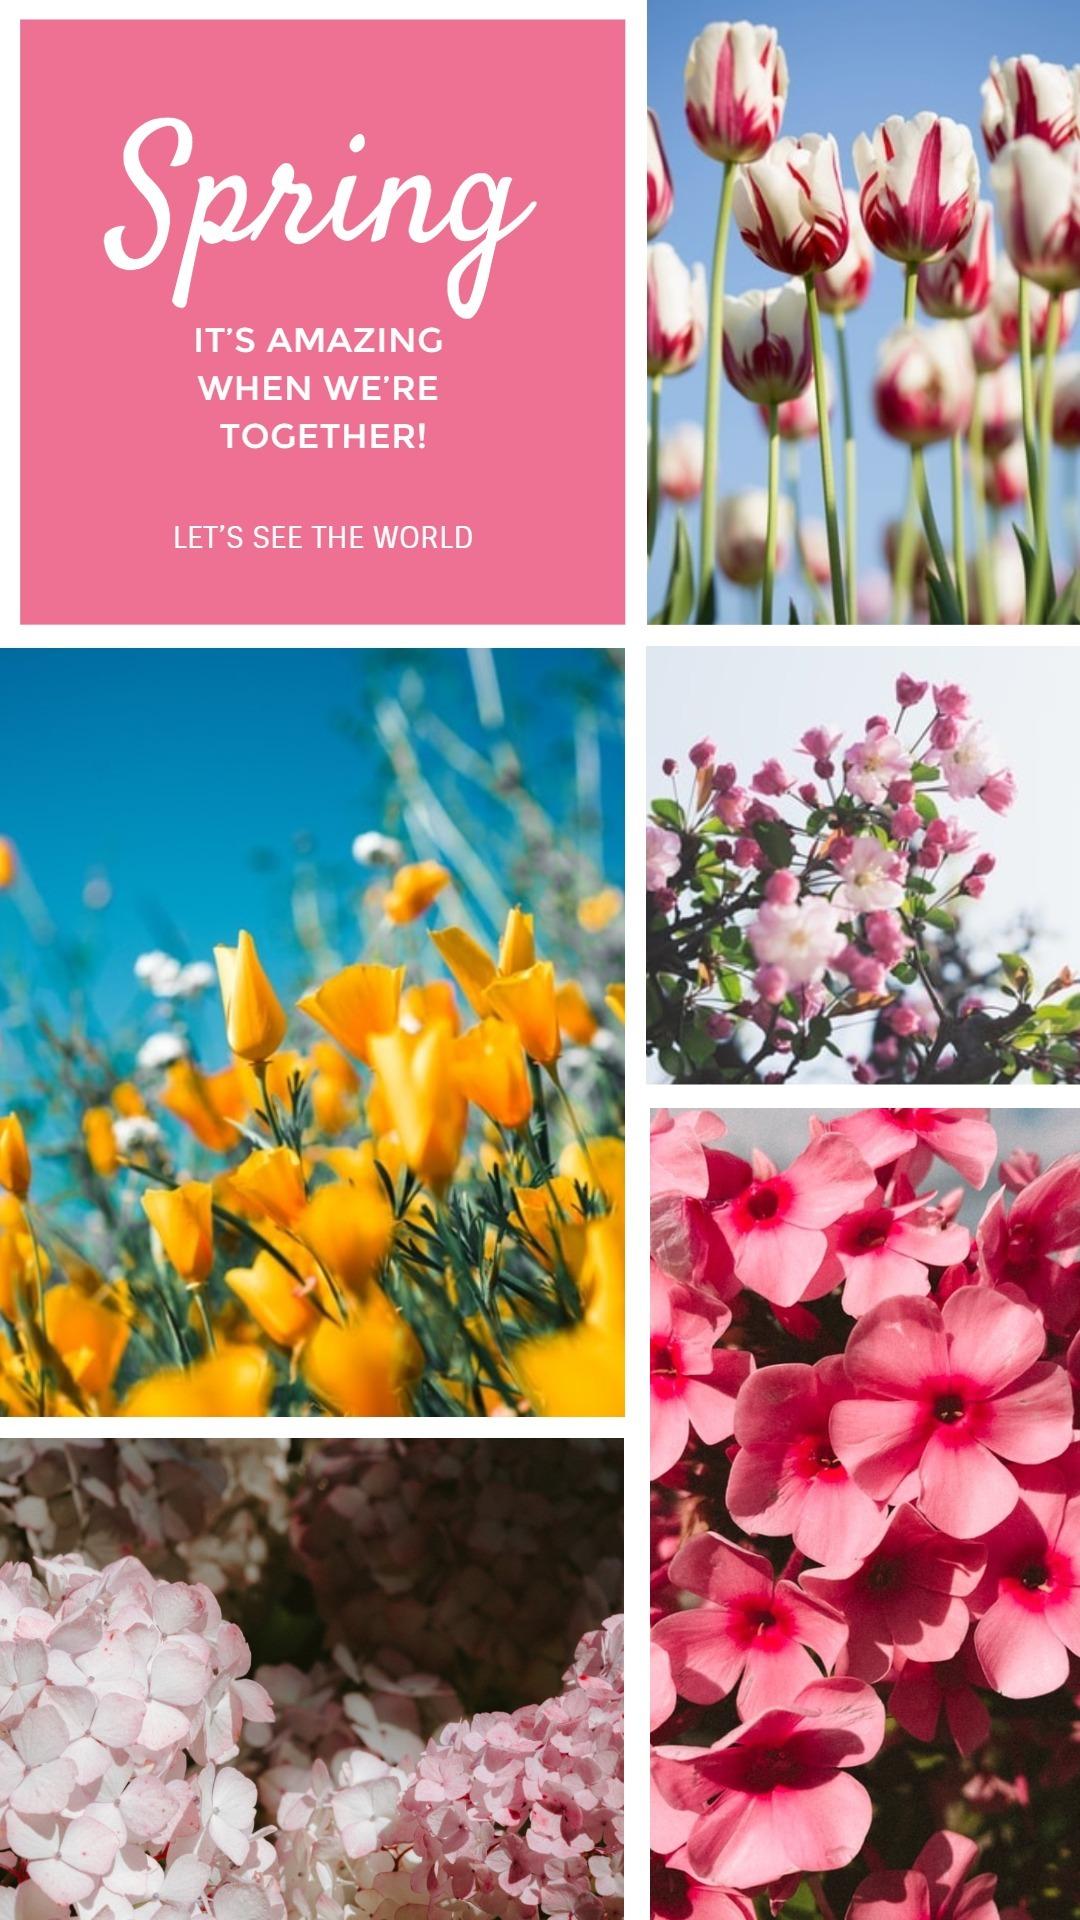 spring3_wl_20200228